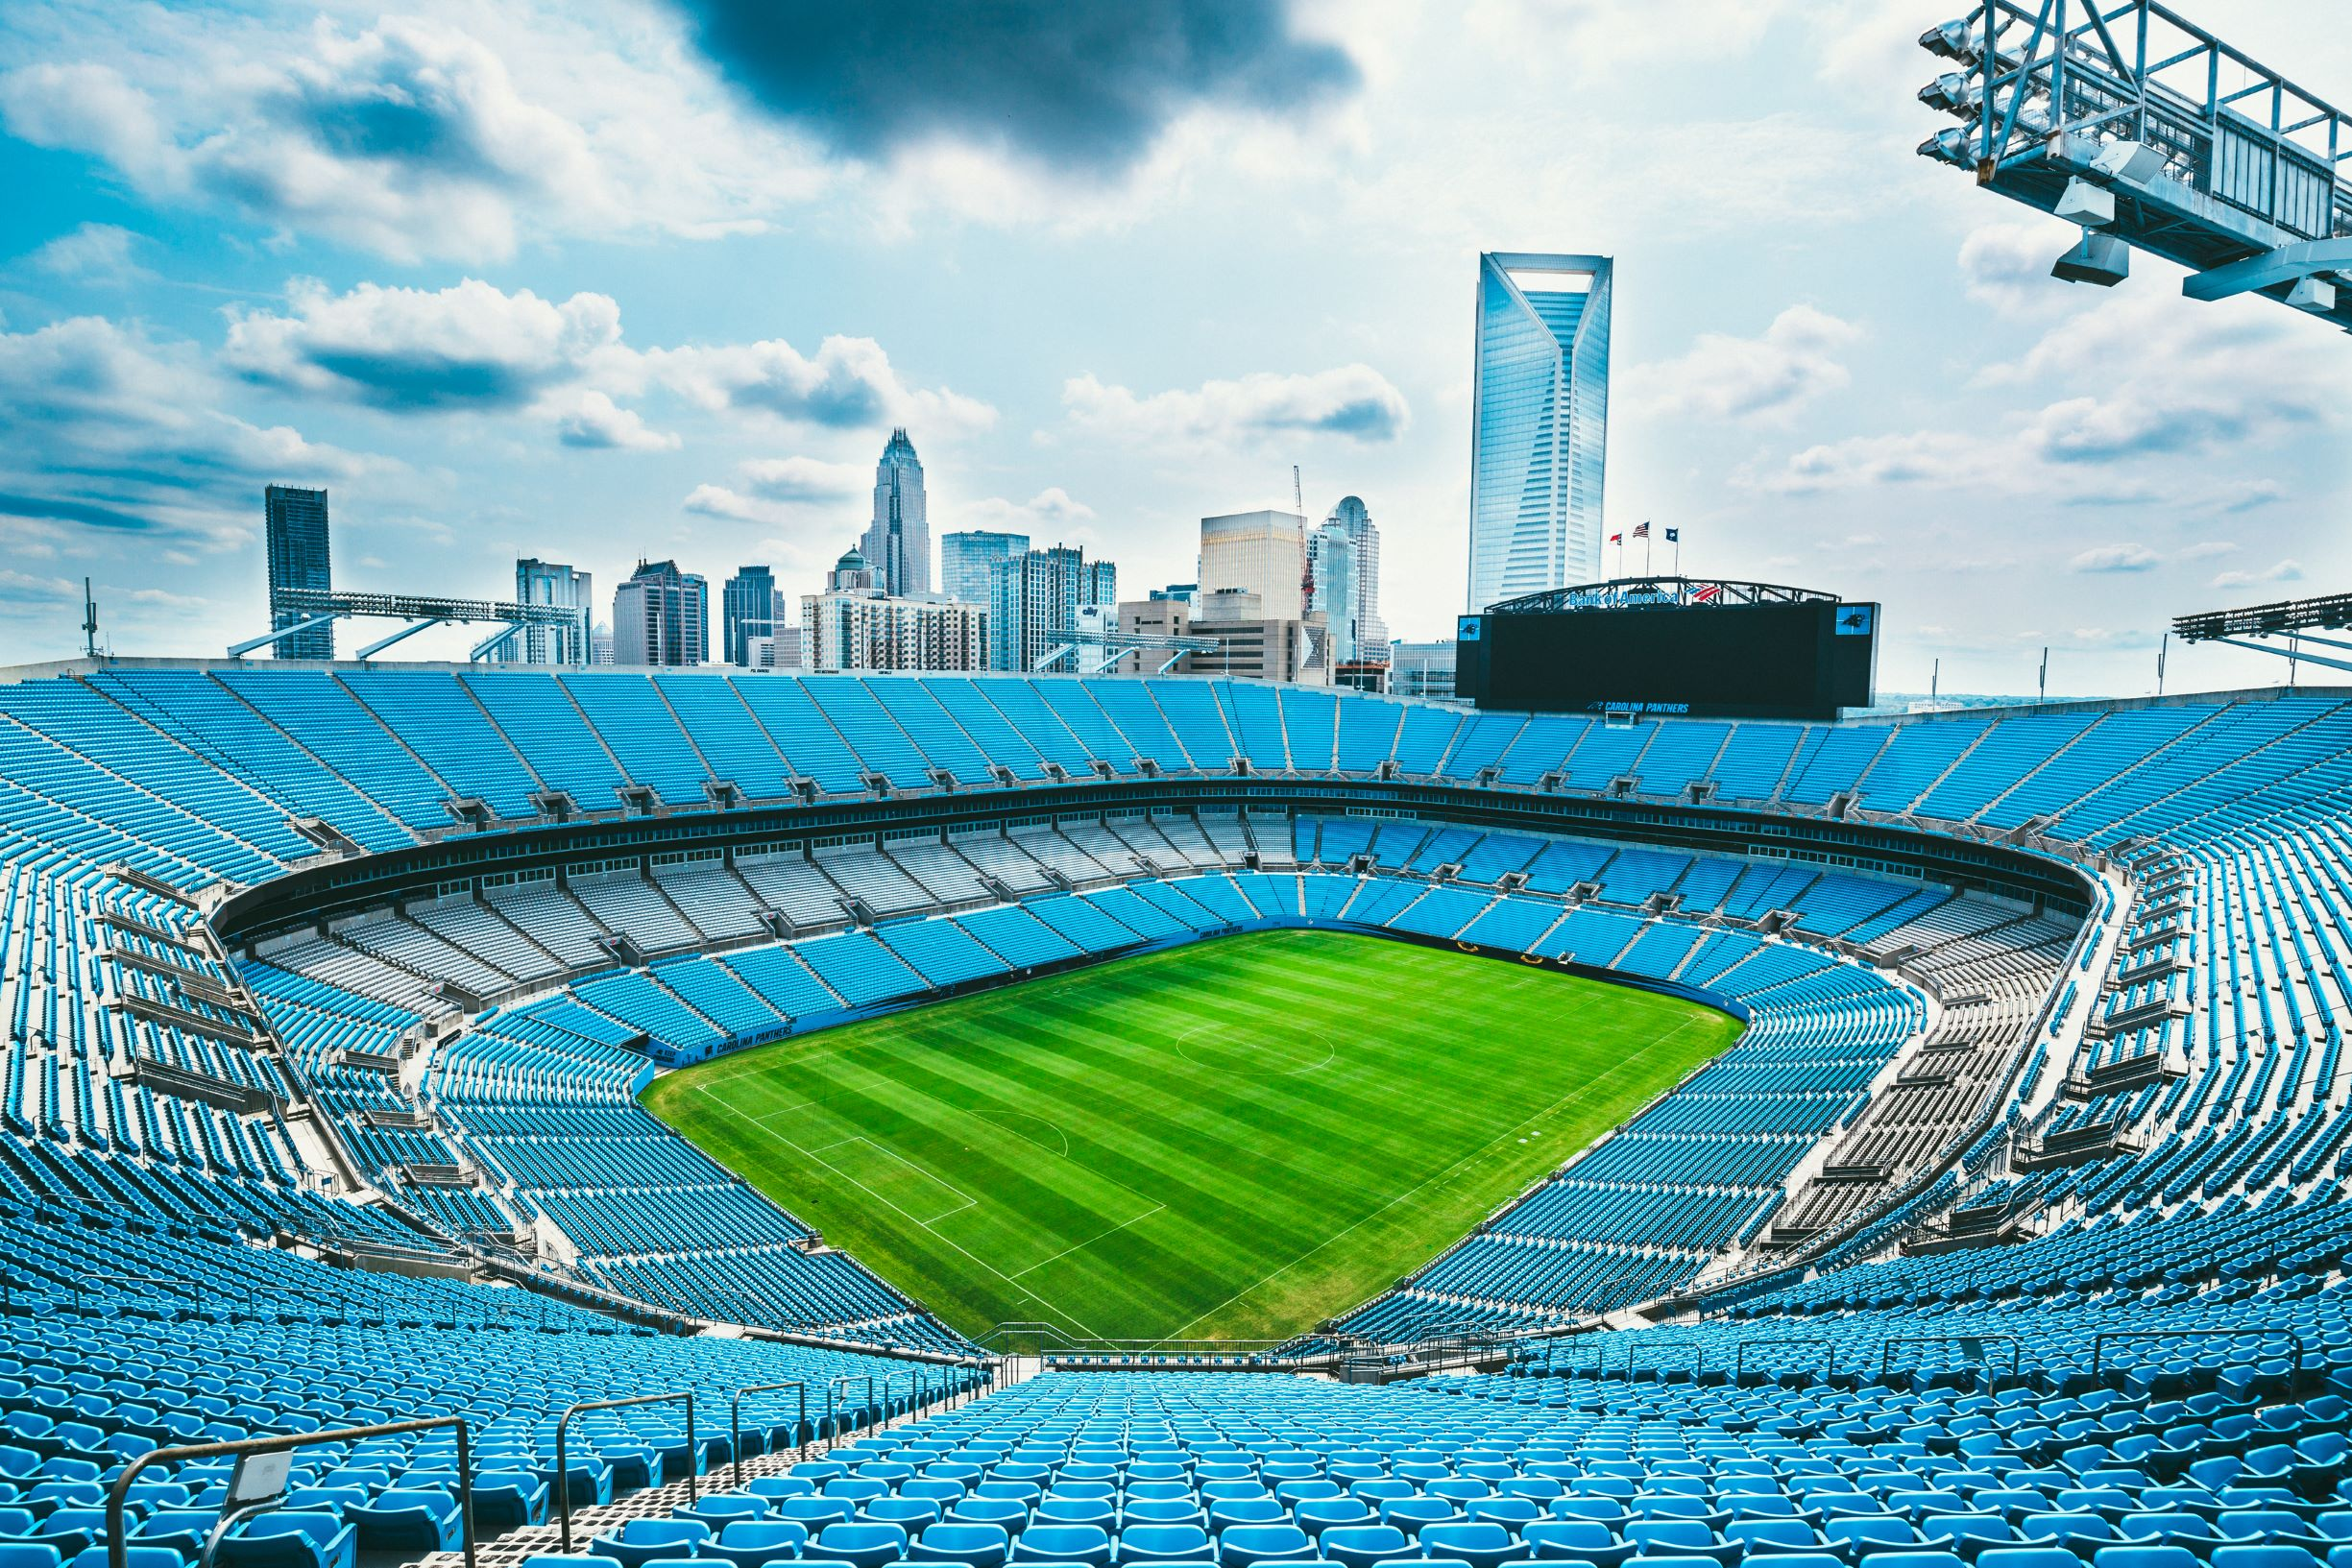 Bank-of-America-Stadium